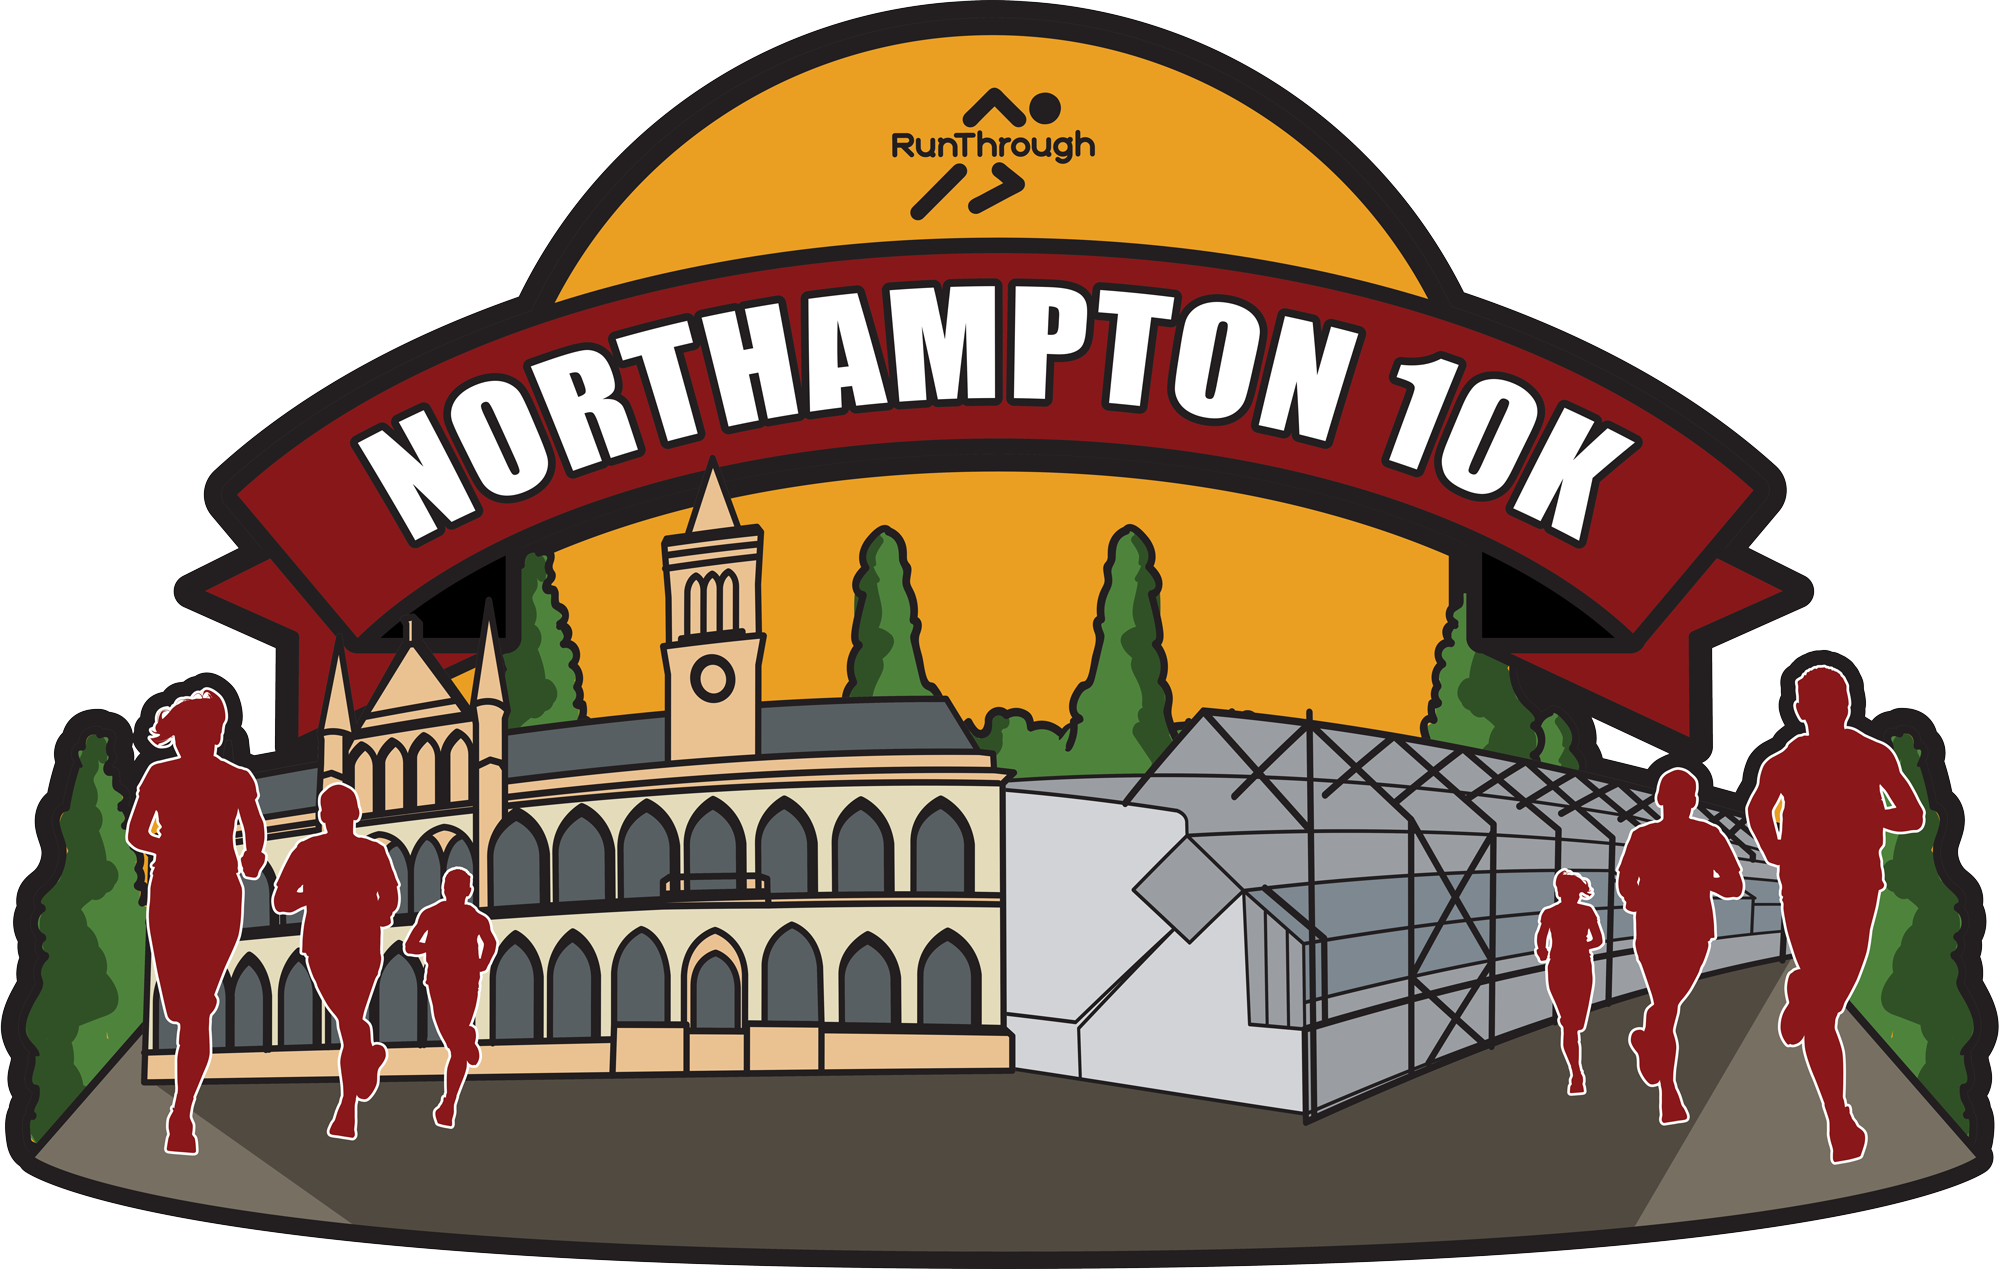 Northampton 10k